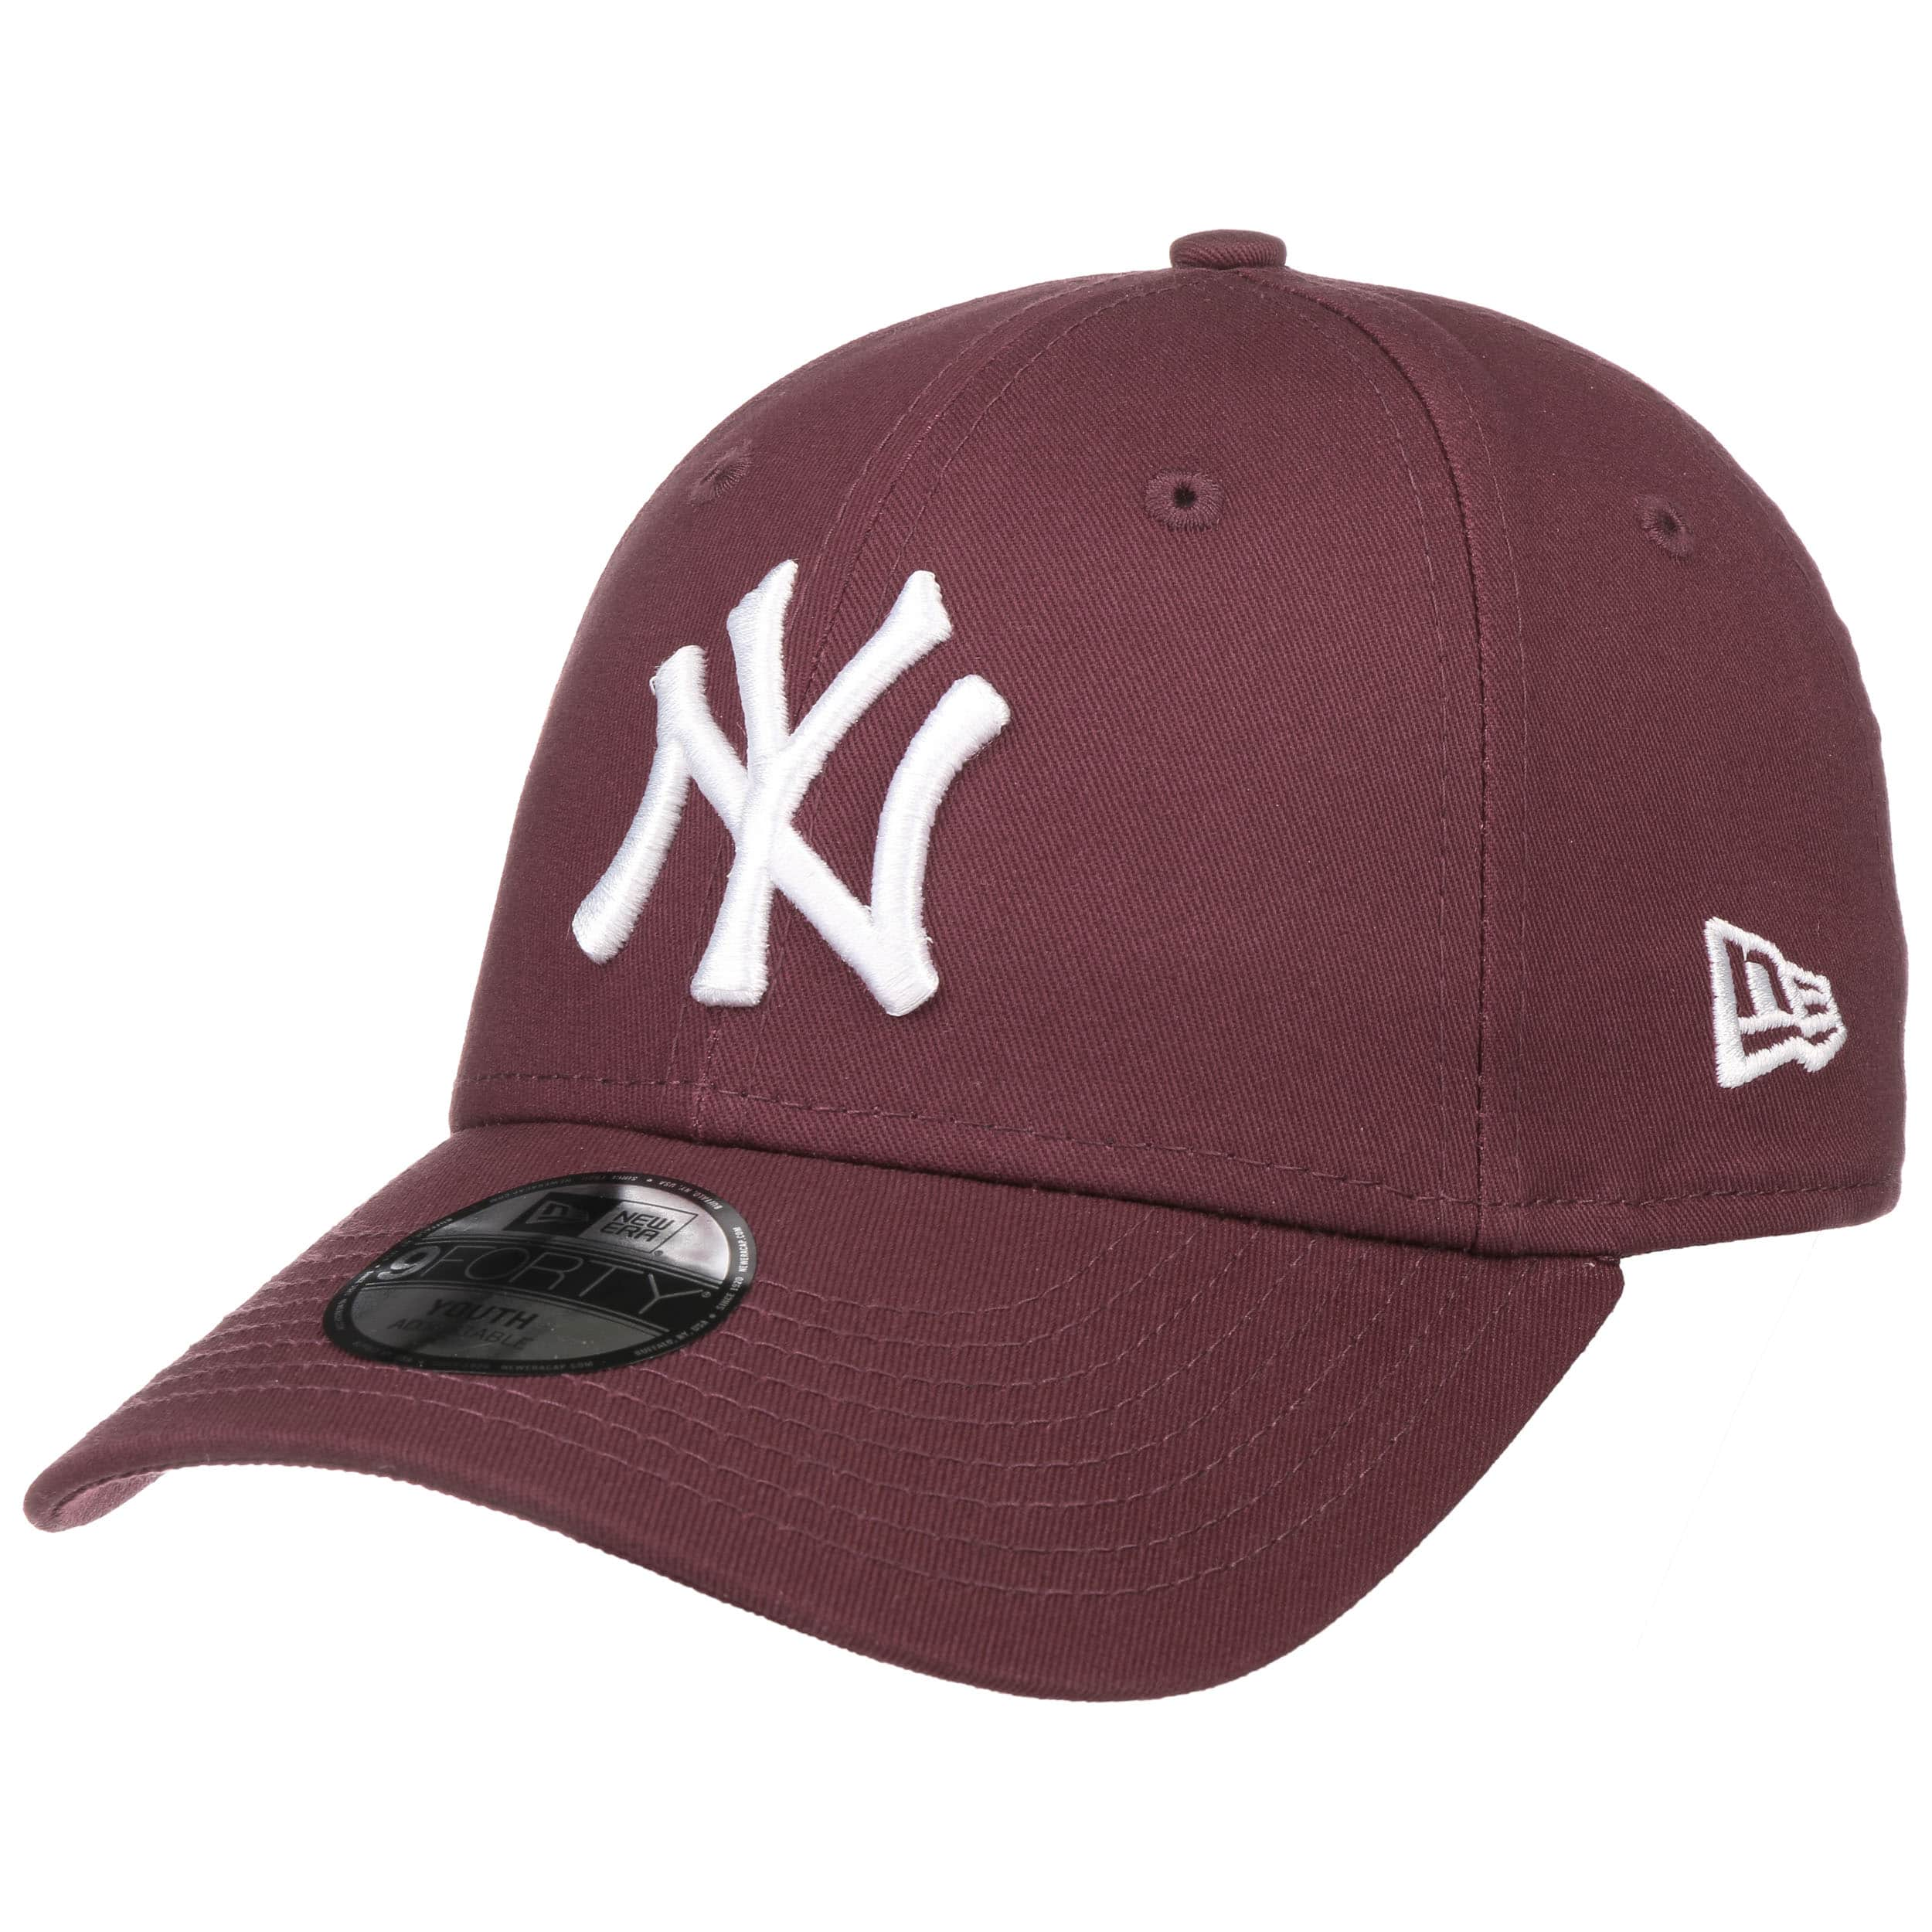 ... Cappellino da Bambino 9Forty League NY by New Era - rosso bordeaux 2 ... 40b28a08b86b